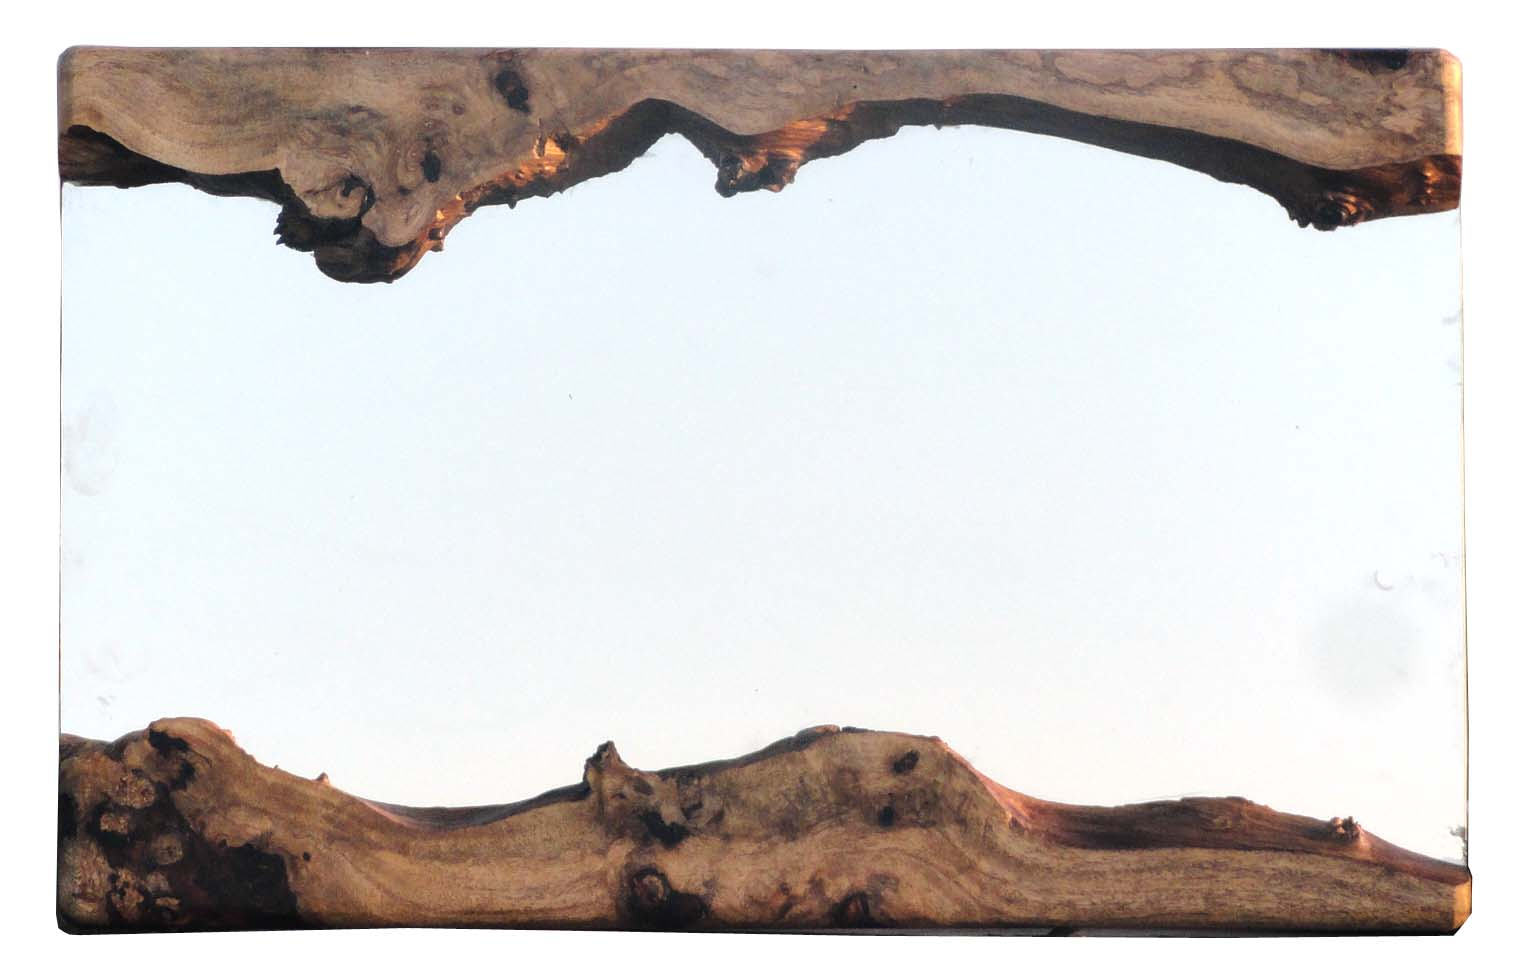 Rustic Wooden Frames Rustic mirror frame